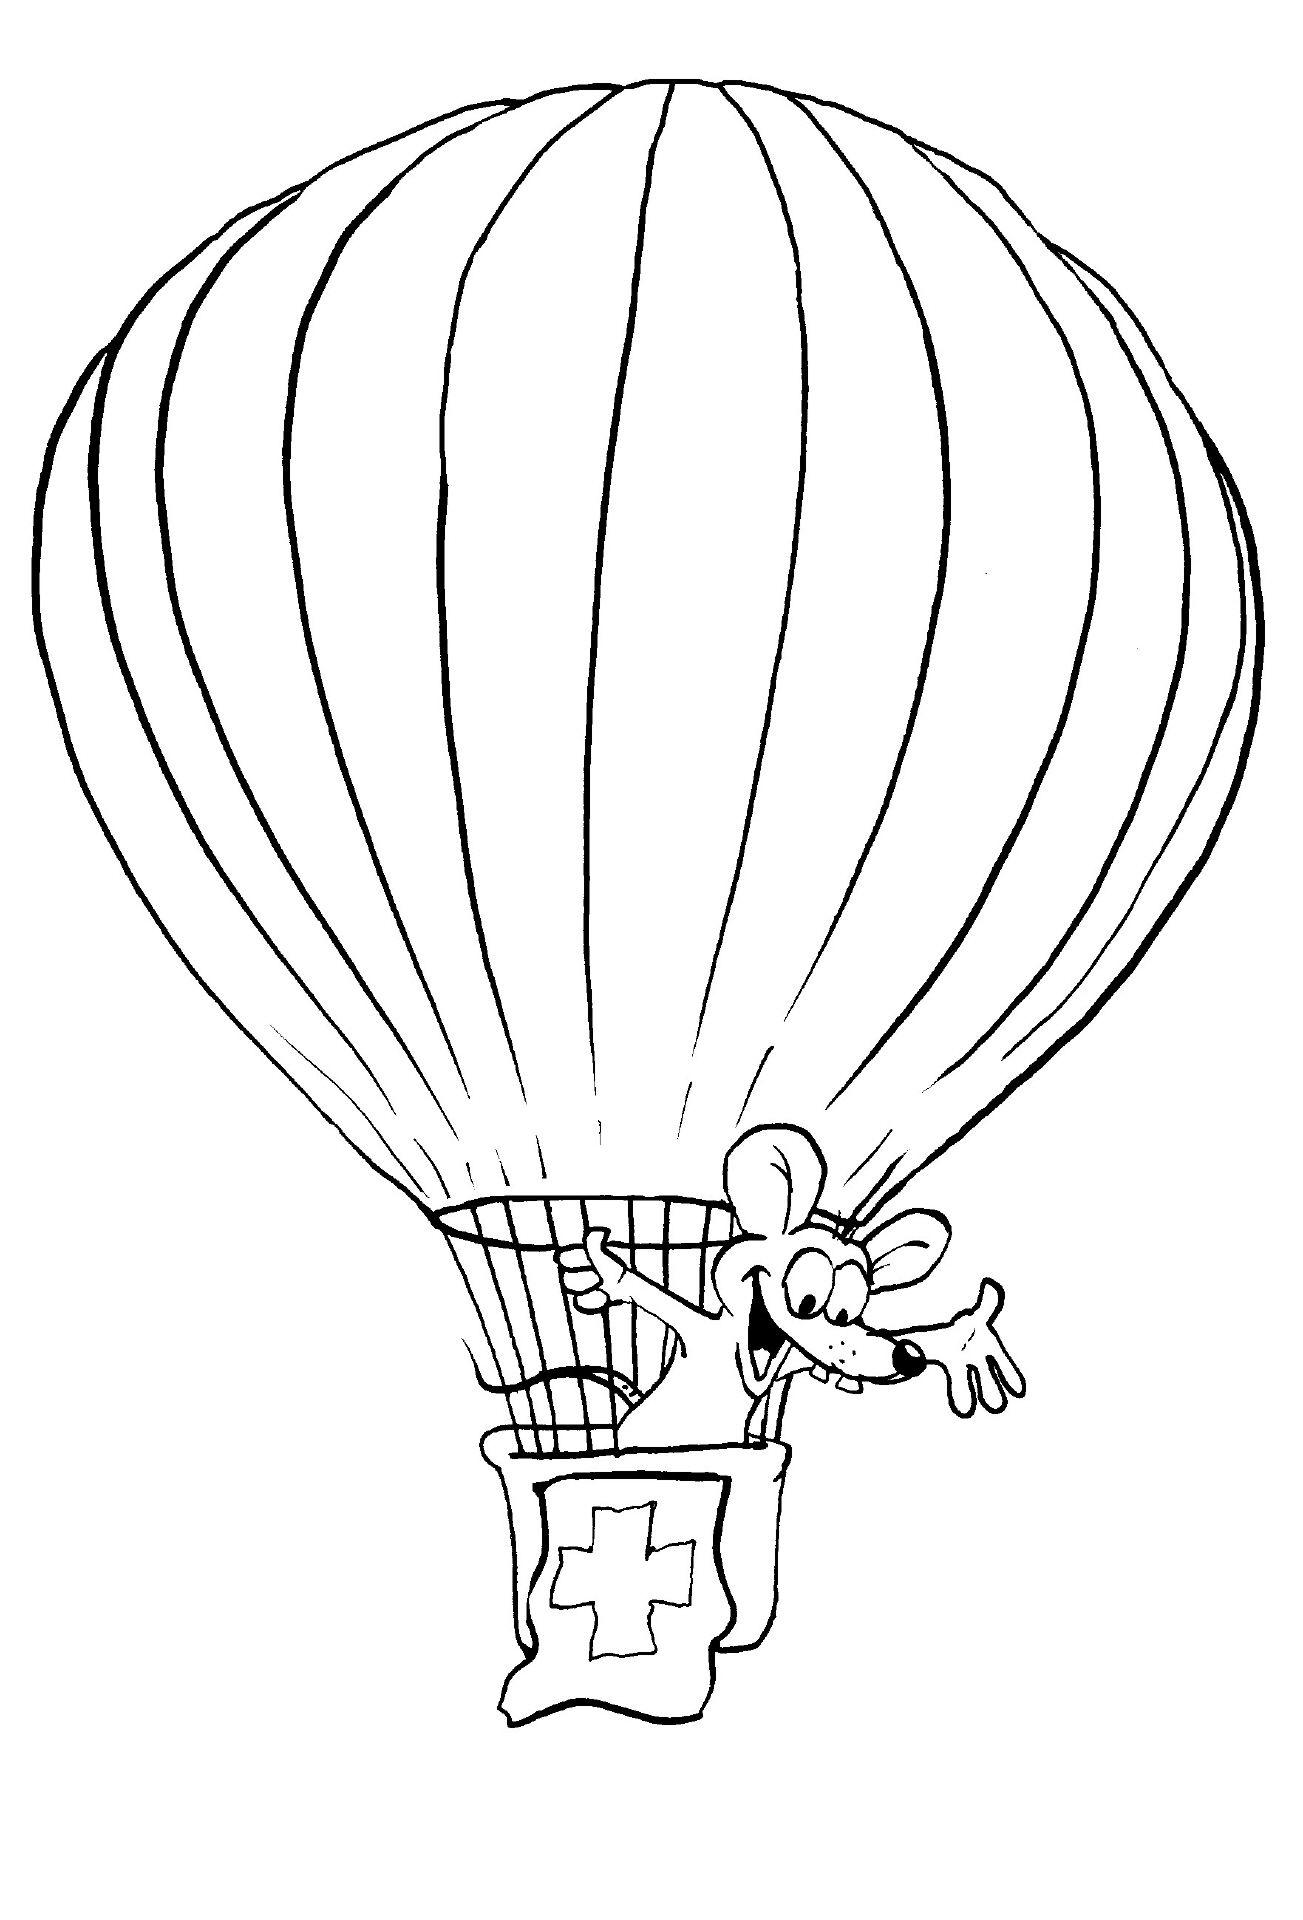 http://kuendigs.ch/images/ballon-sw.jpg   Ausmalbilder allgemein ...